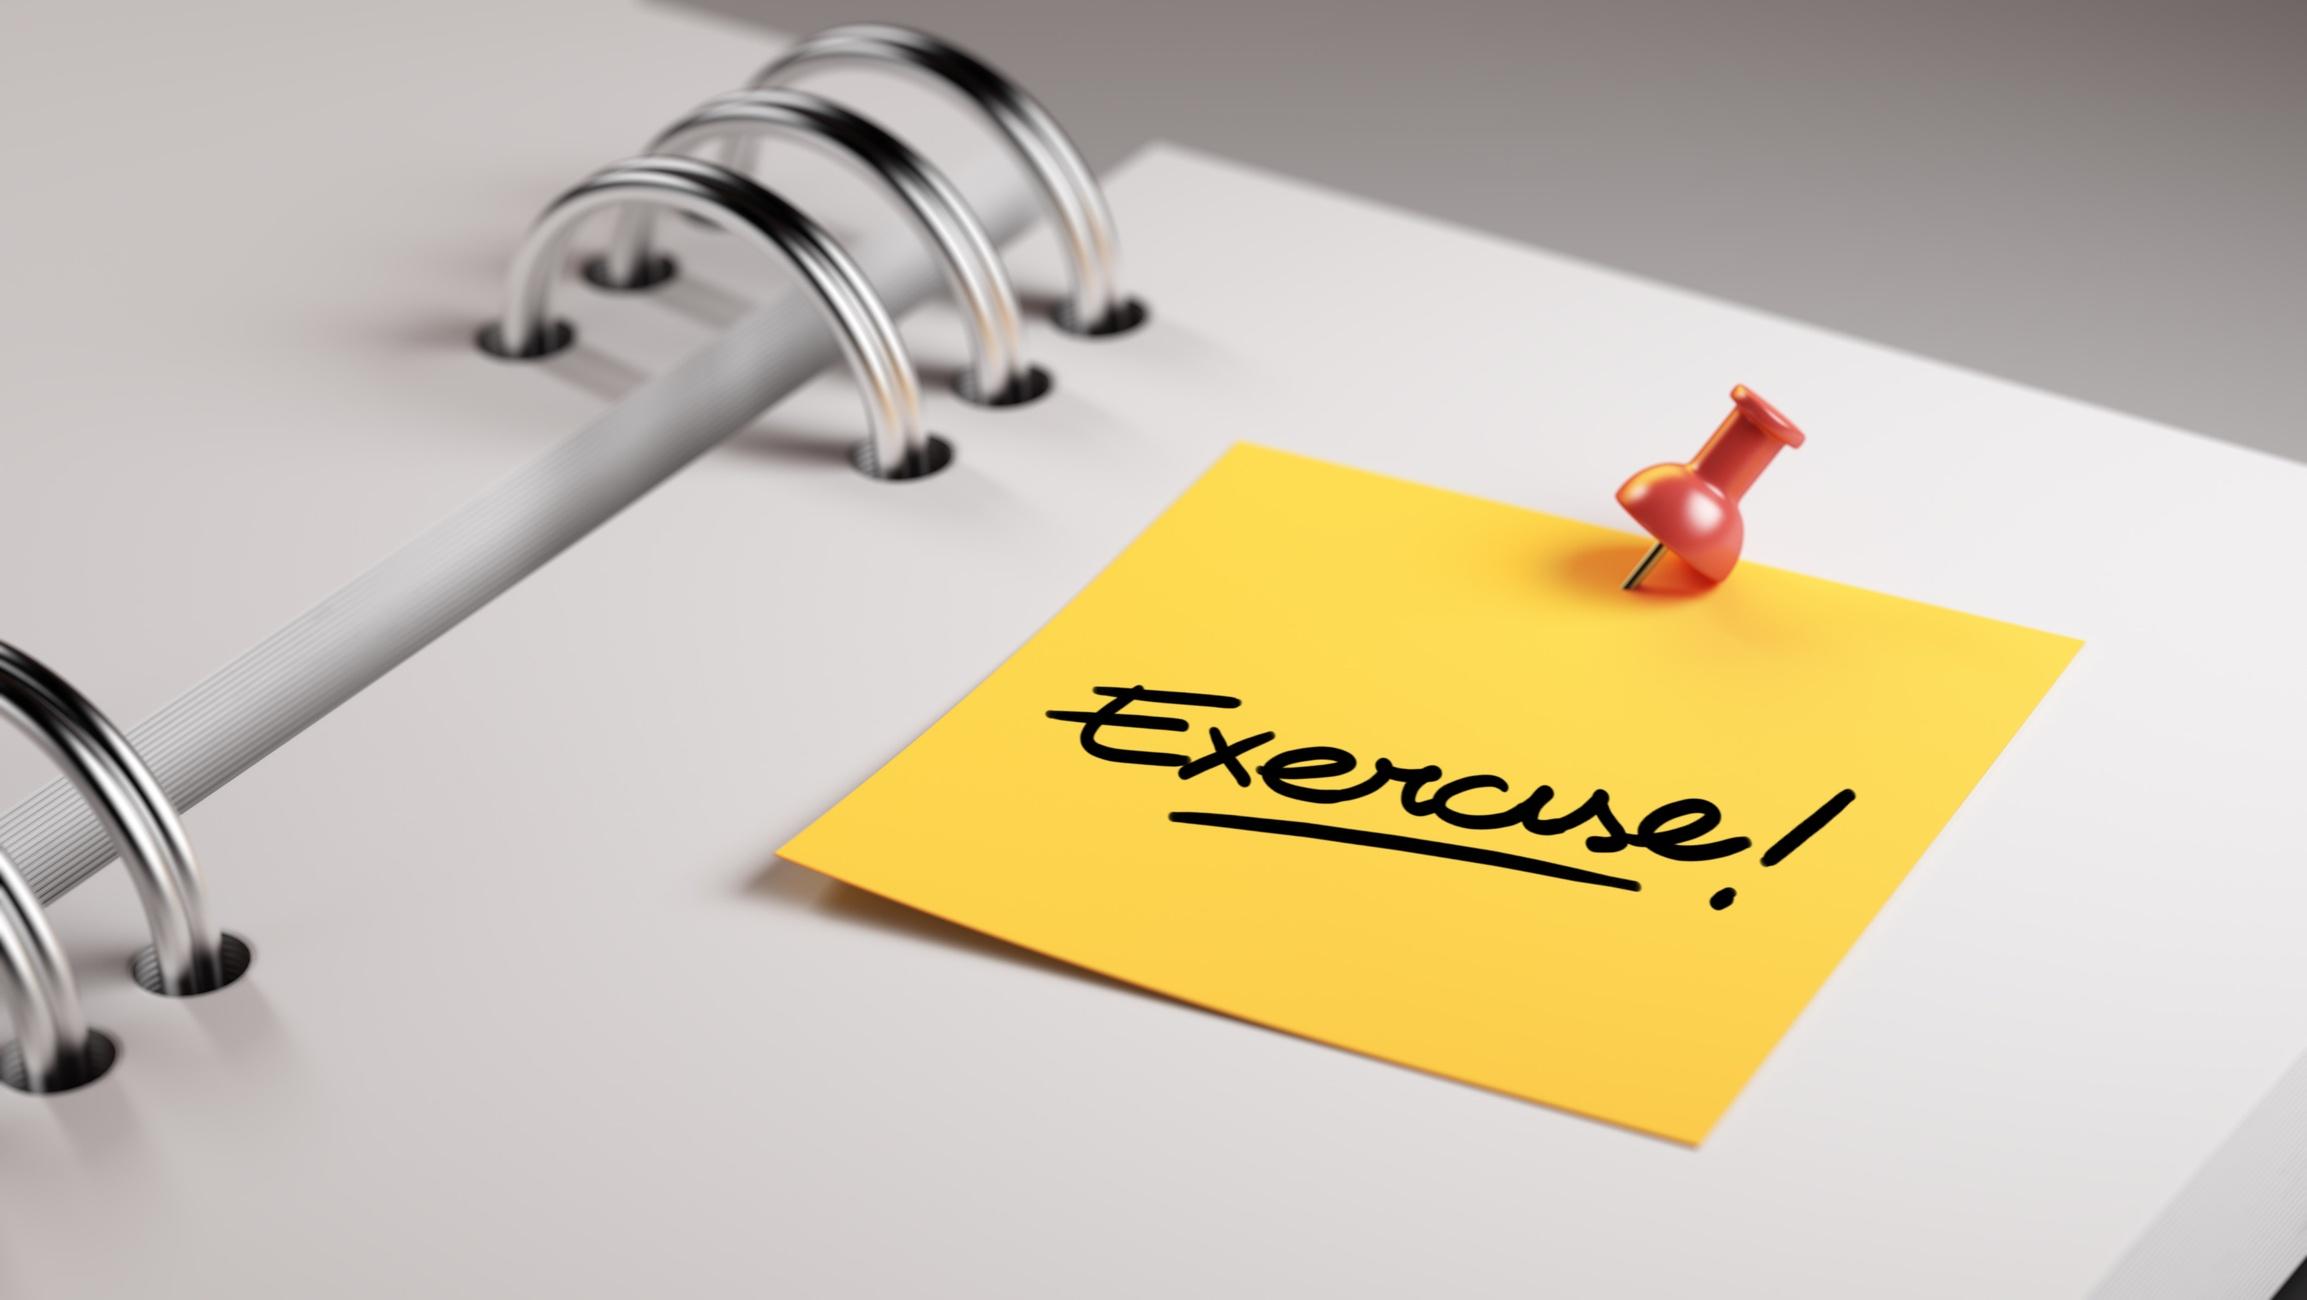 NIFS | Exercise Reminder